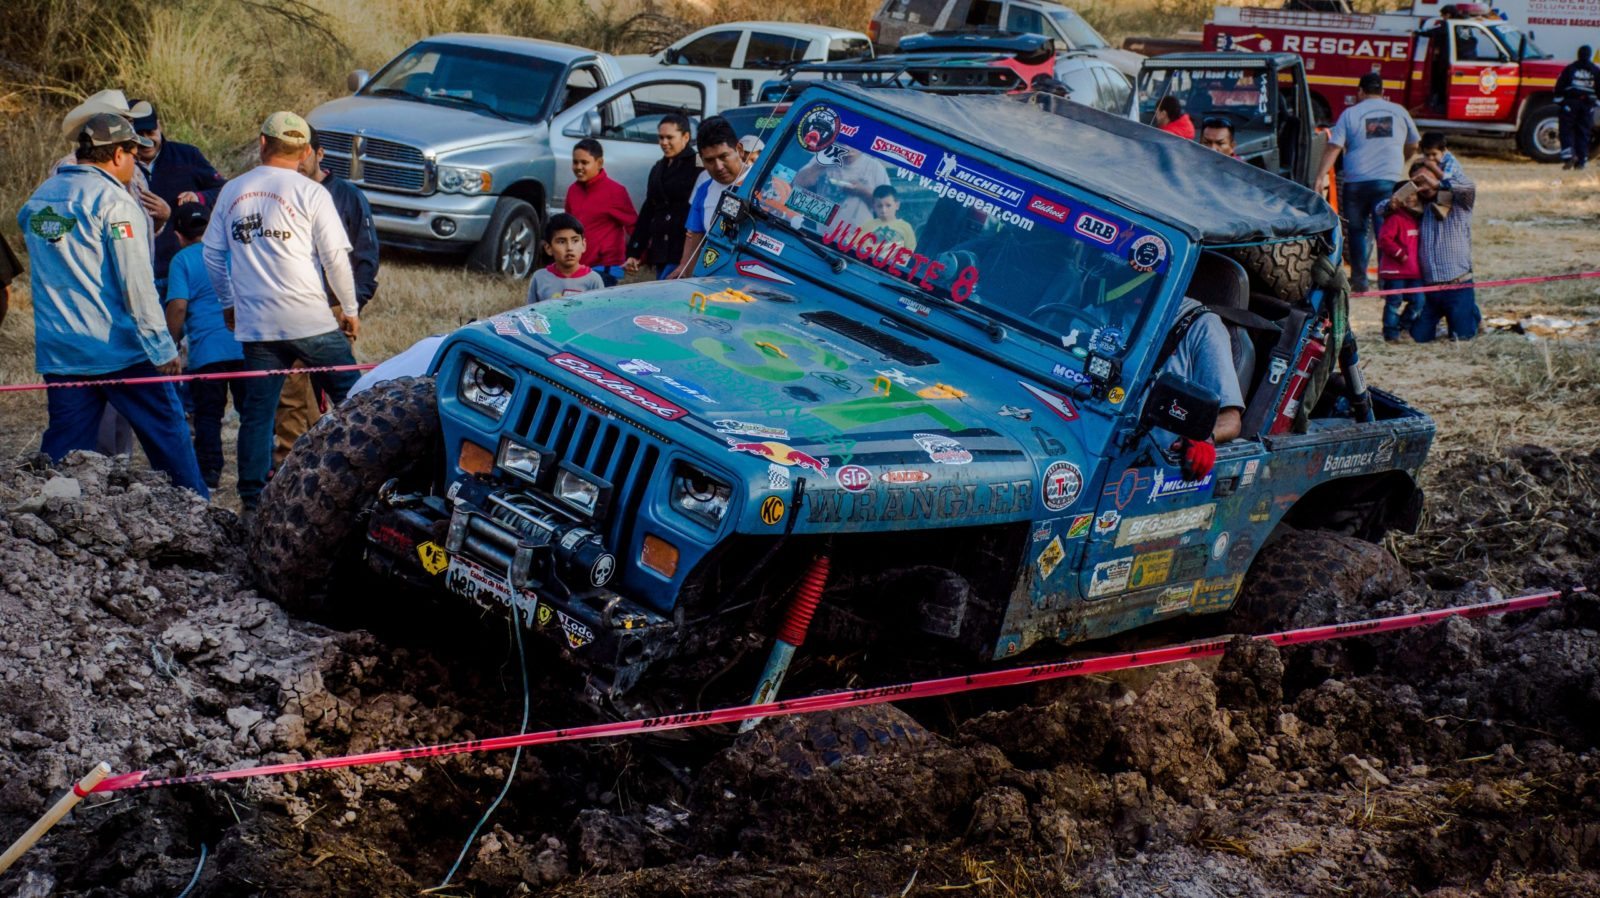 oketsu and traffic congestion from mud